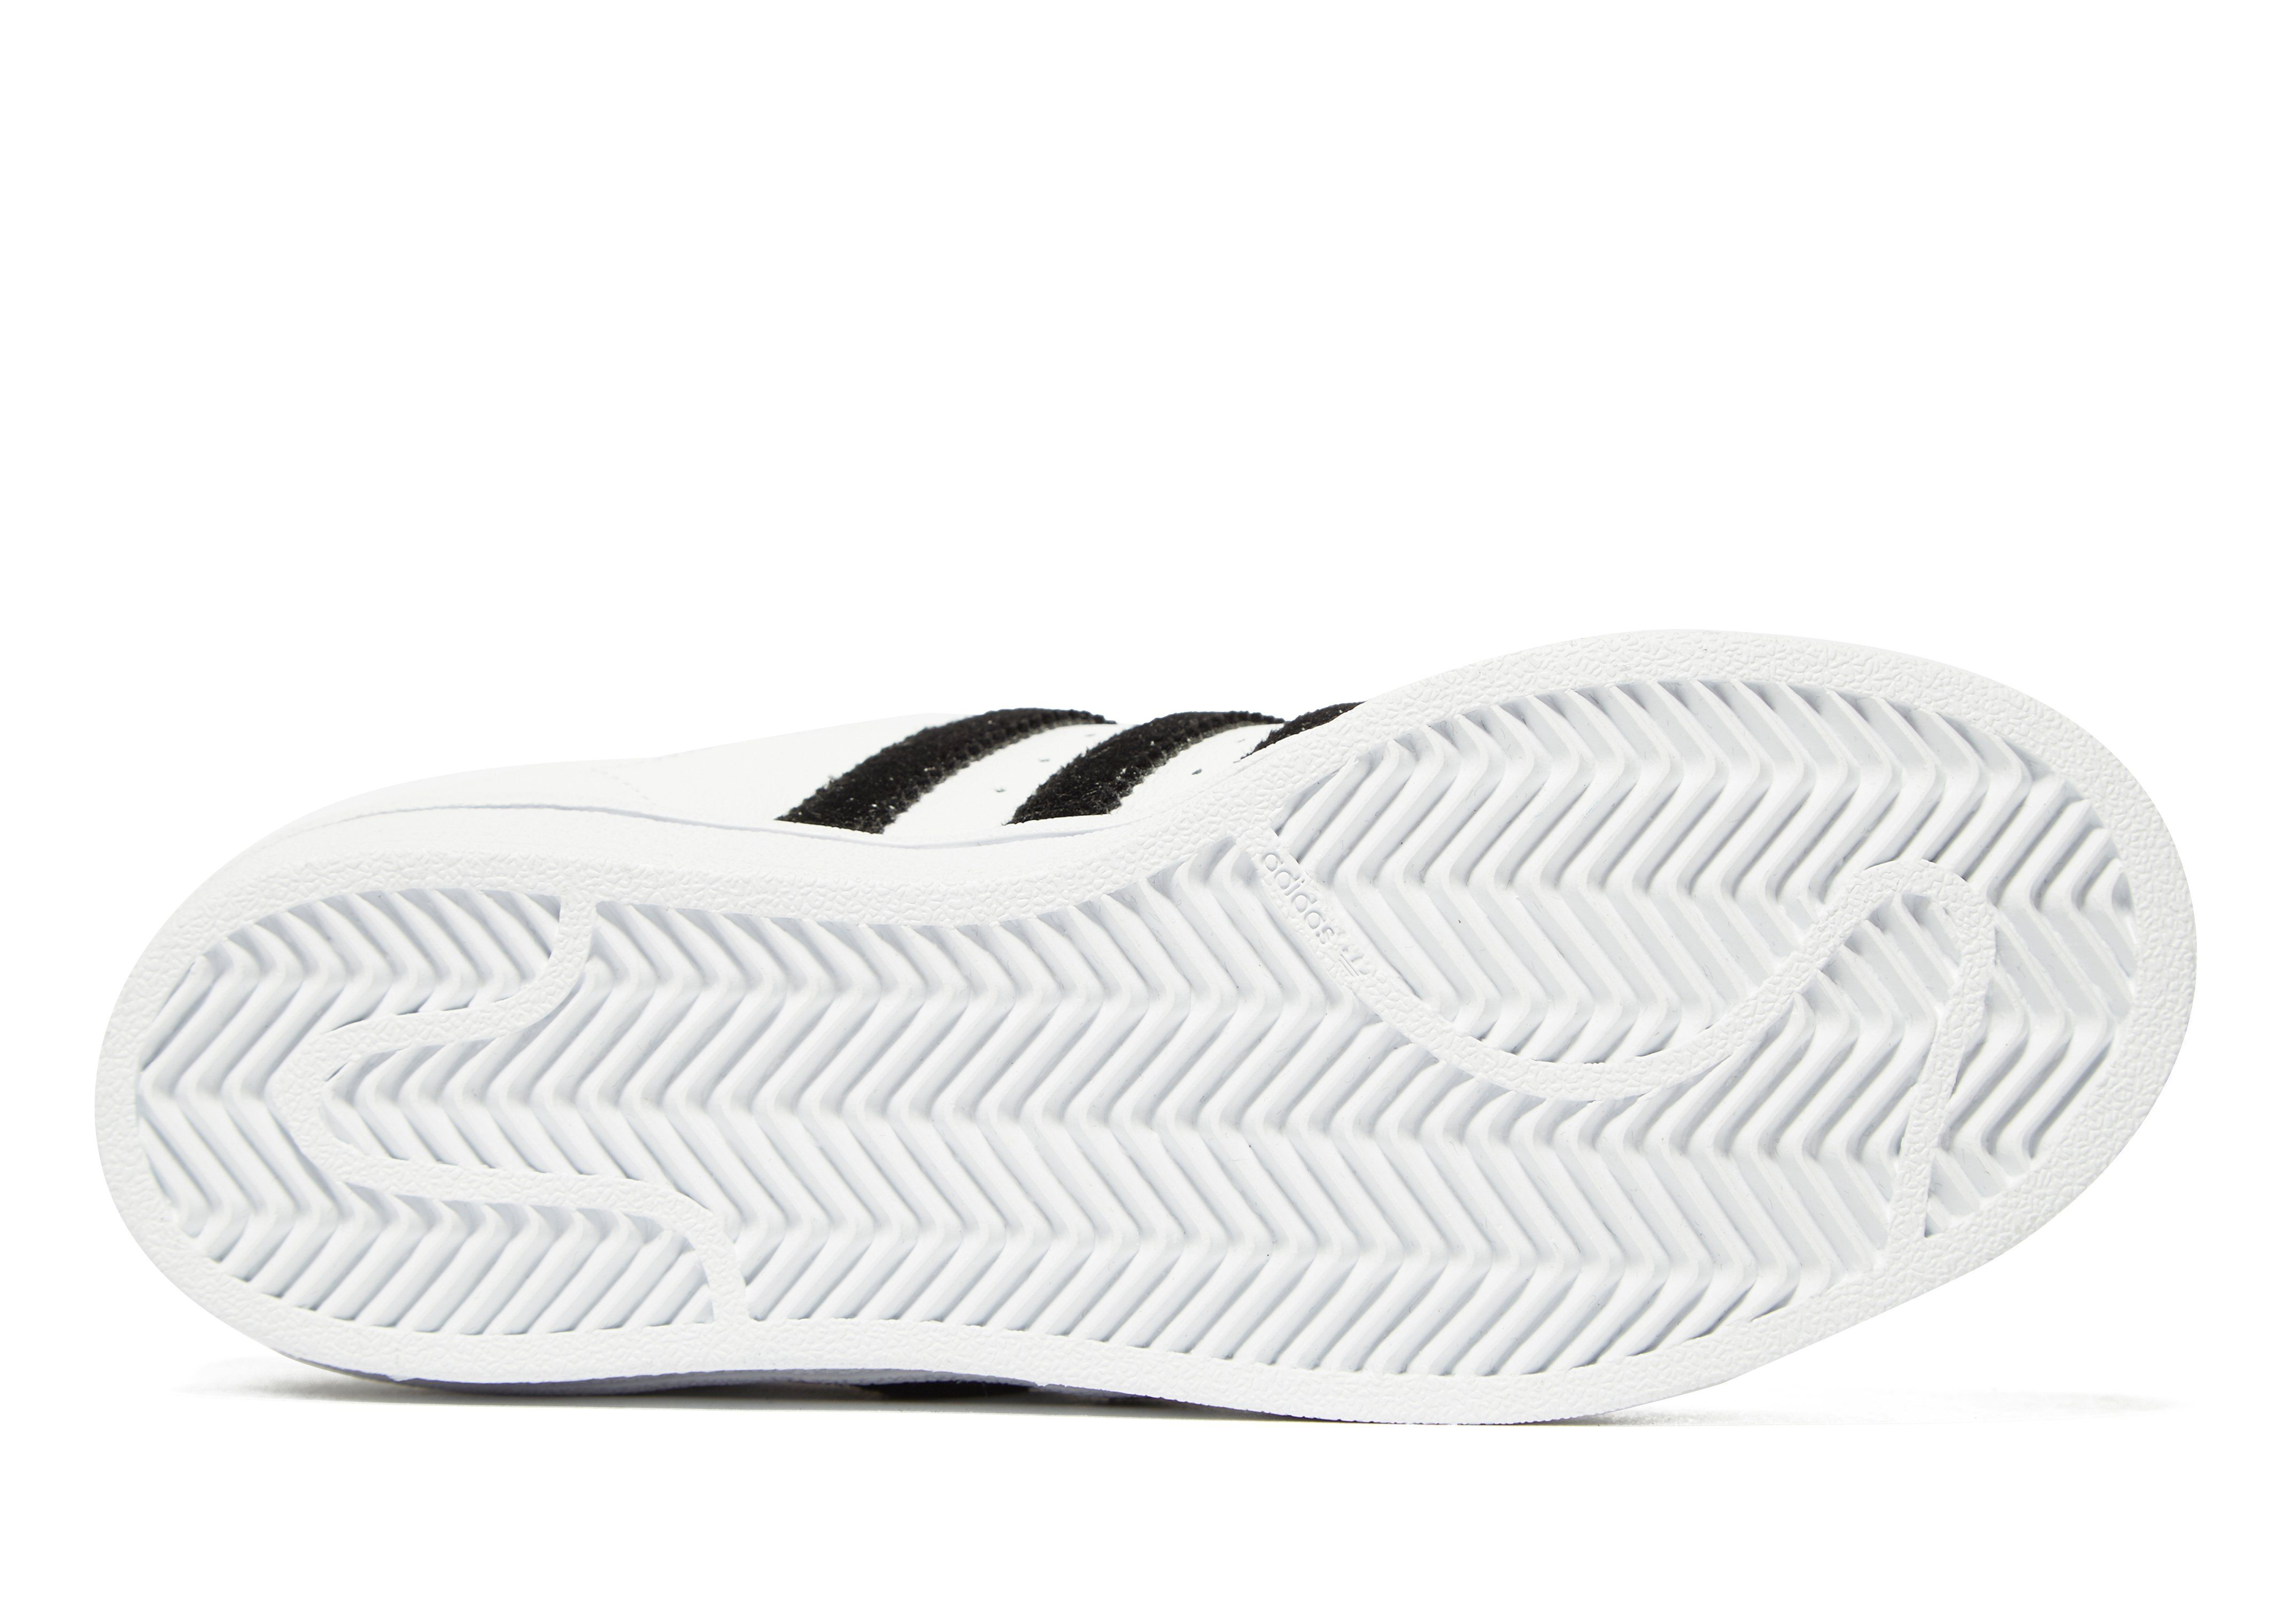 adidas Originals Superstar Velvet Damen Weiss Steckdose Neuesten 10d2BfR0pY